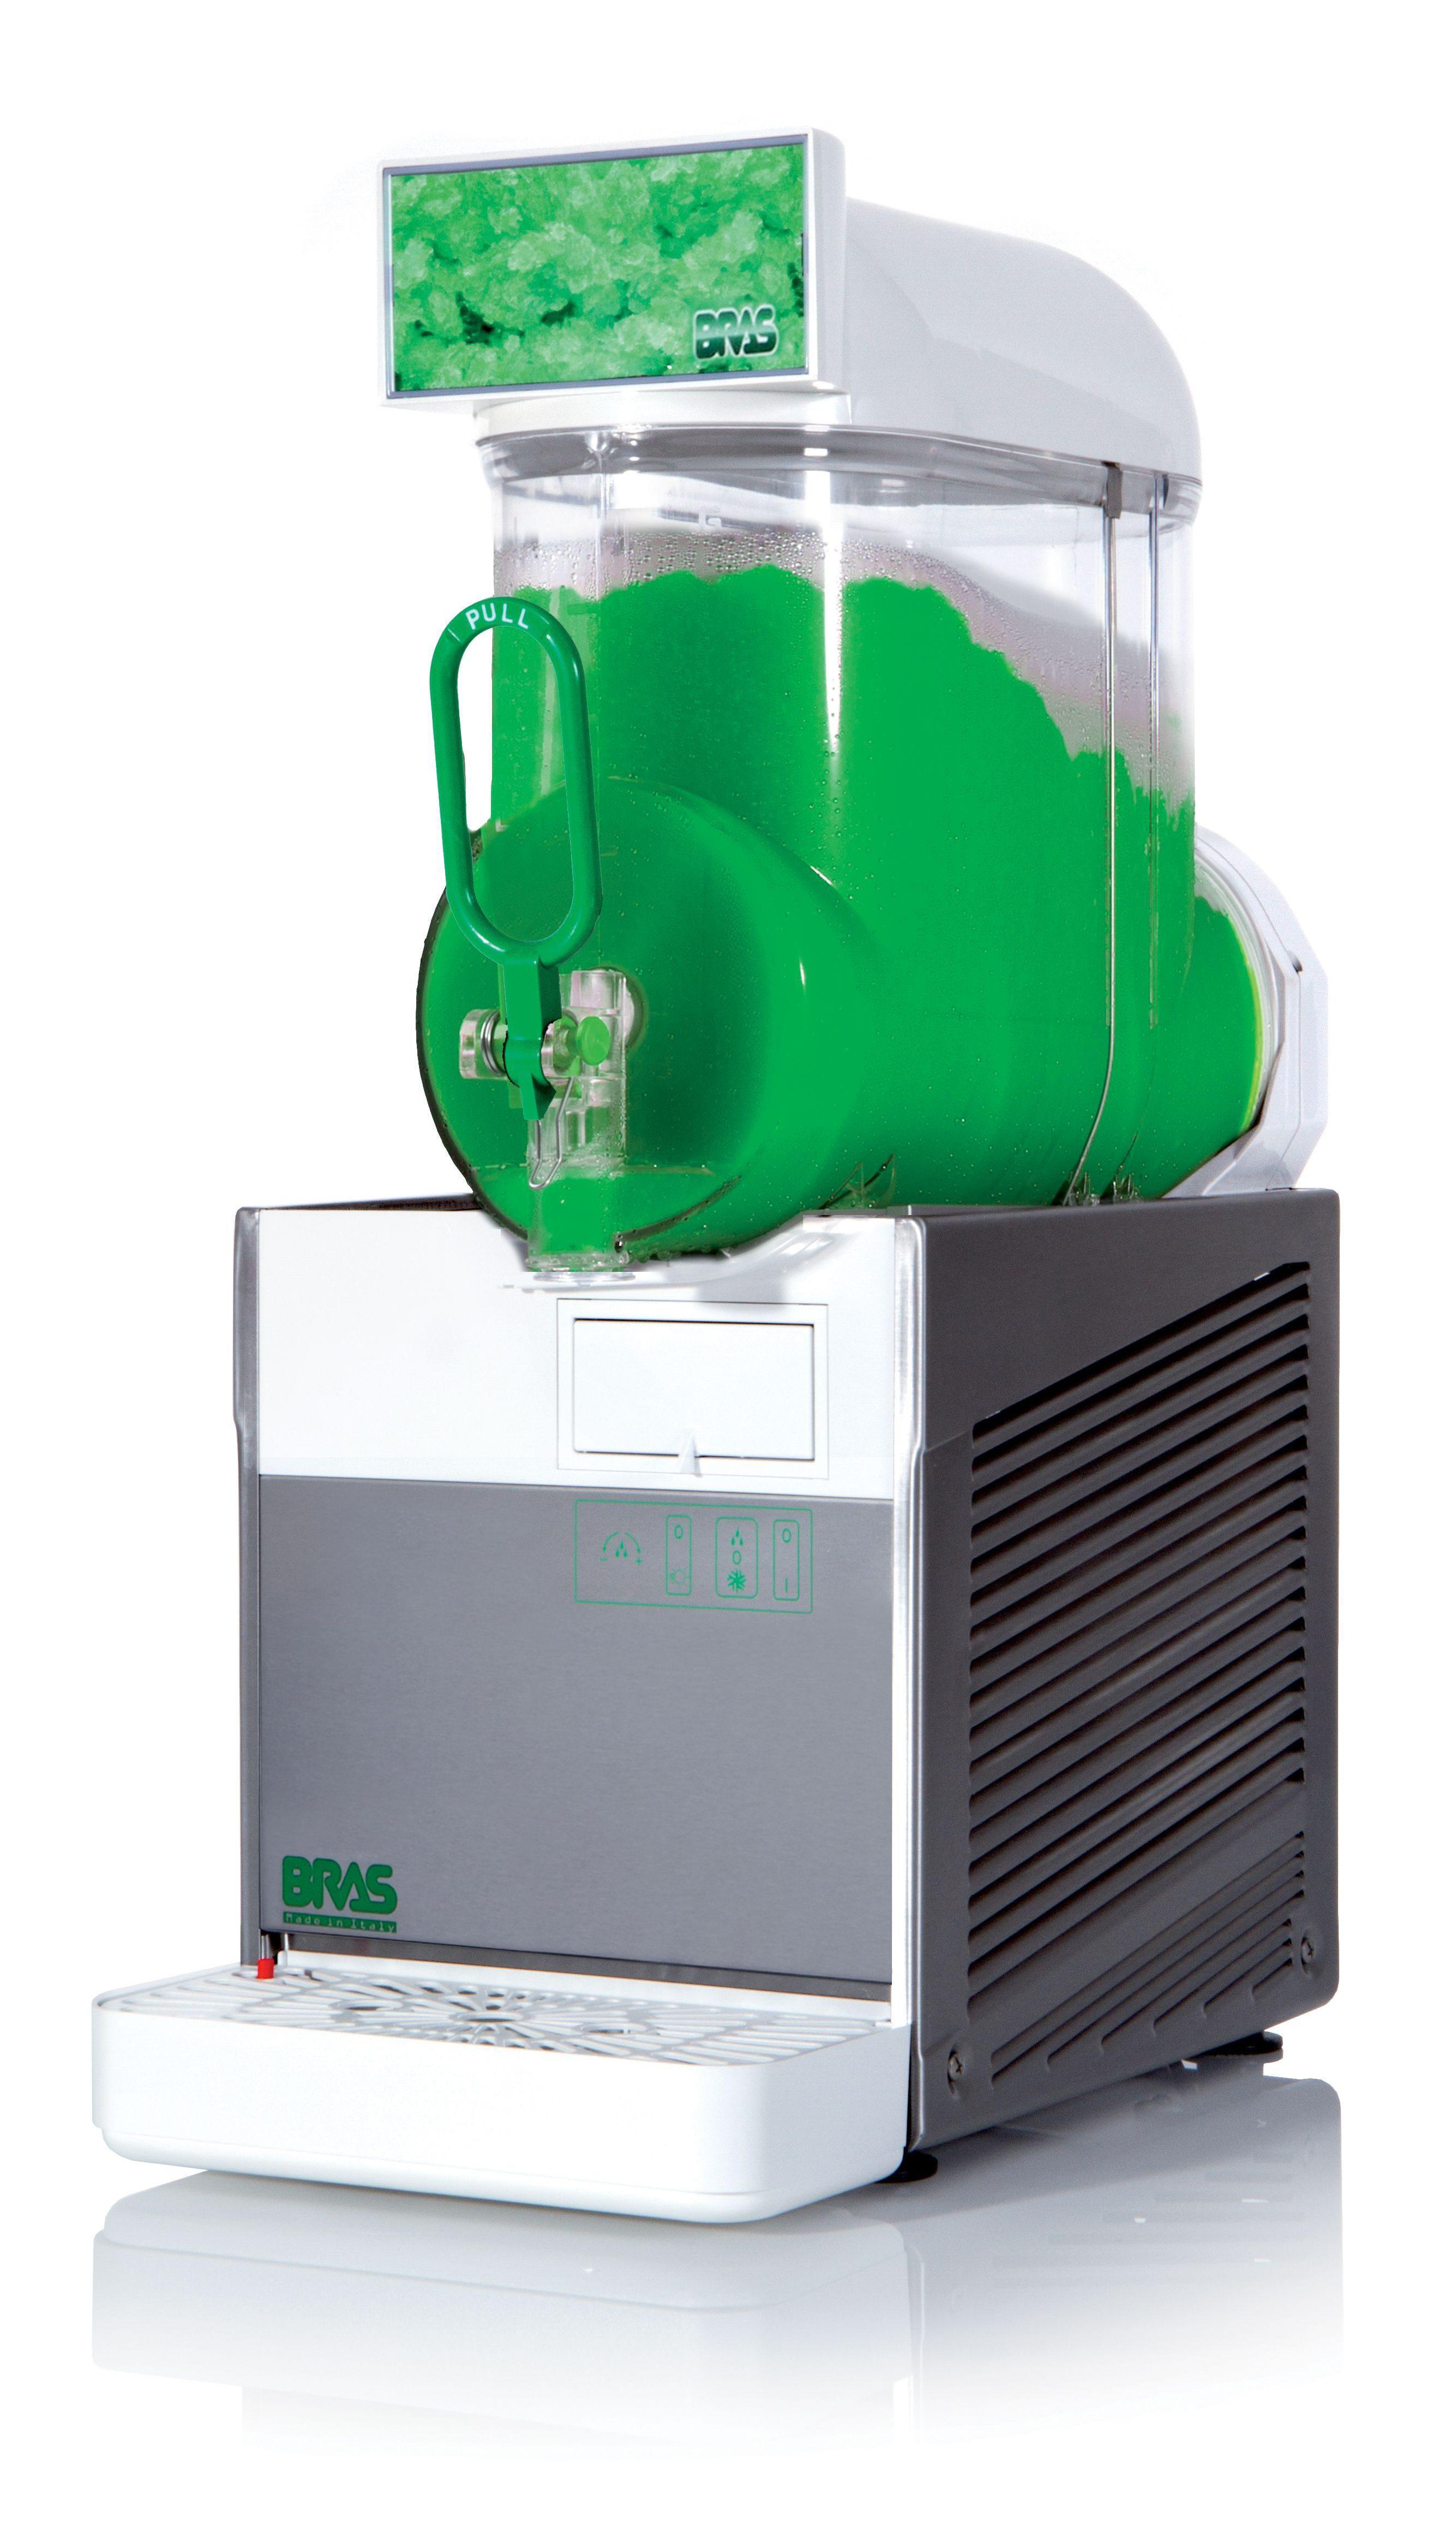 FBM 1 slushmachine